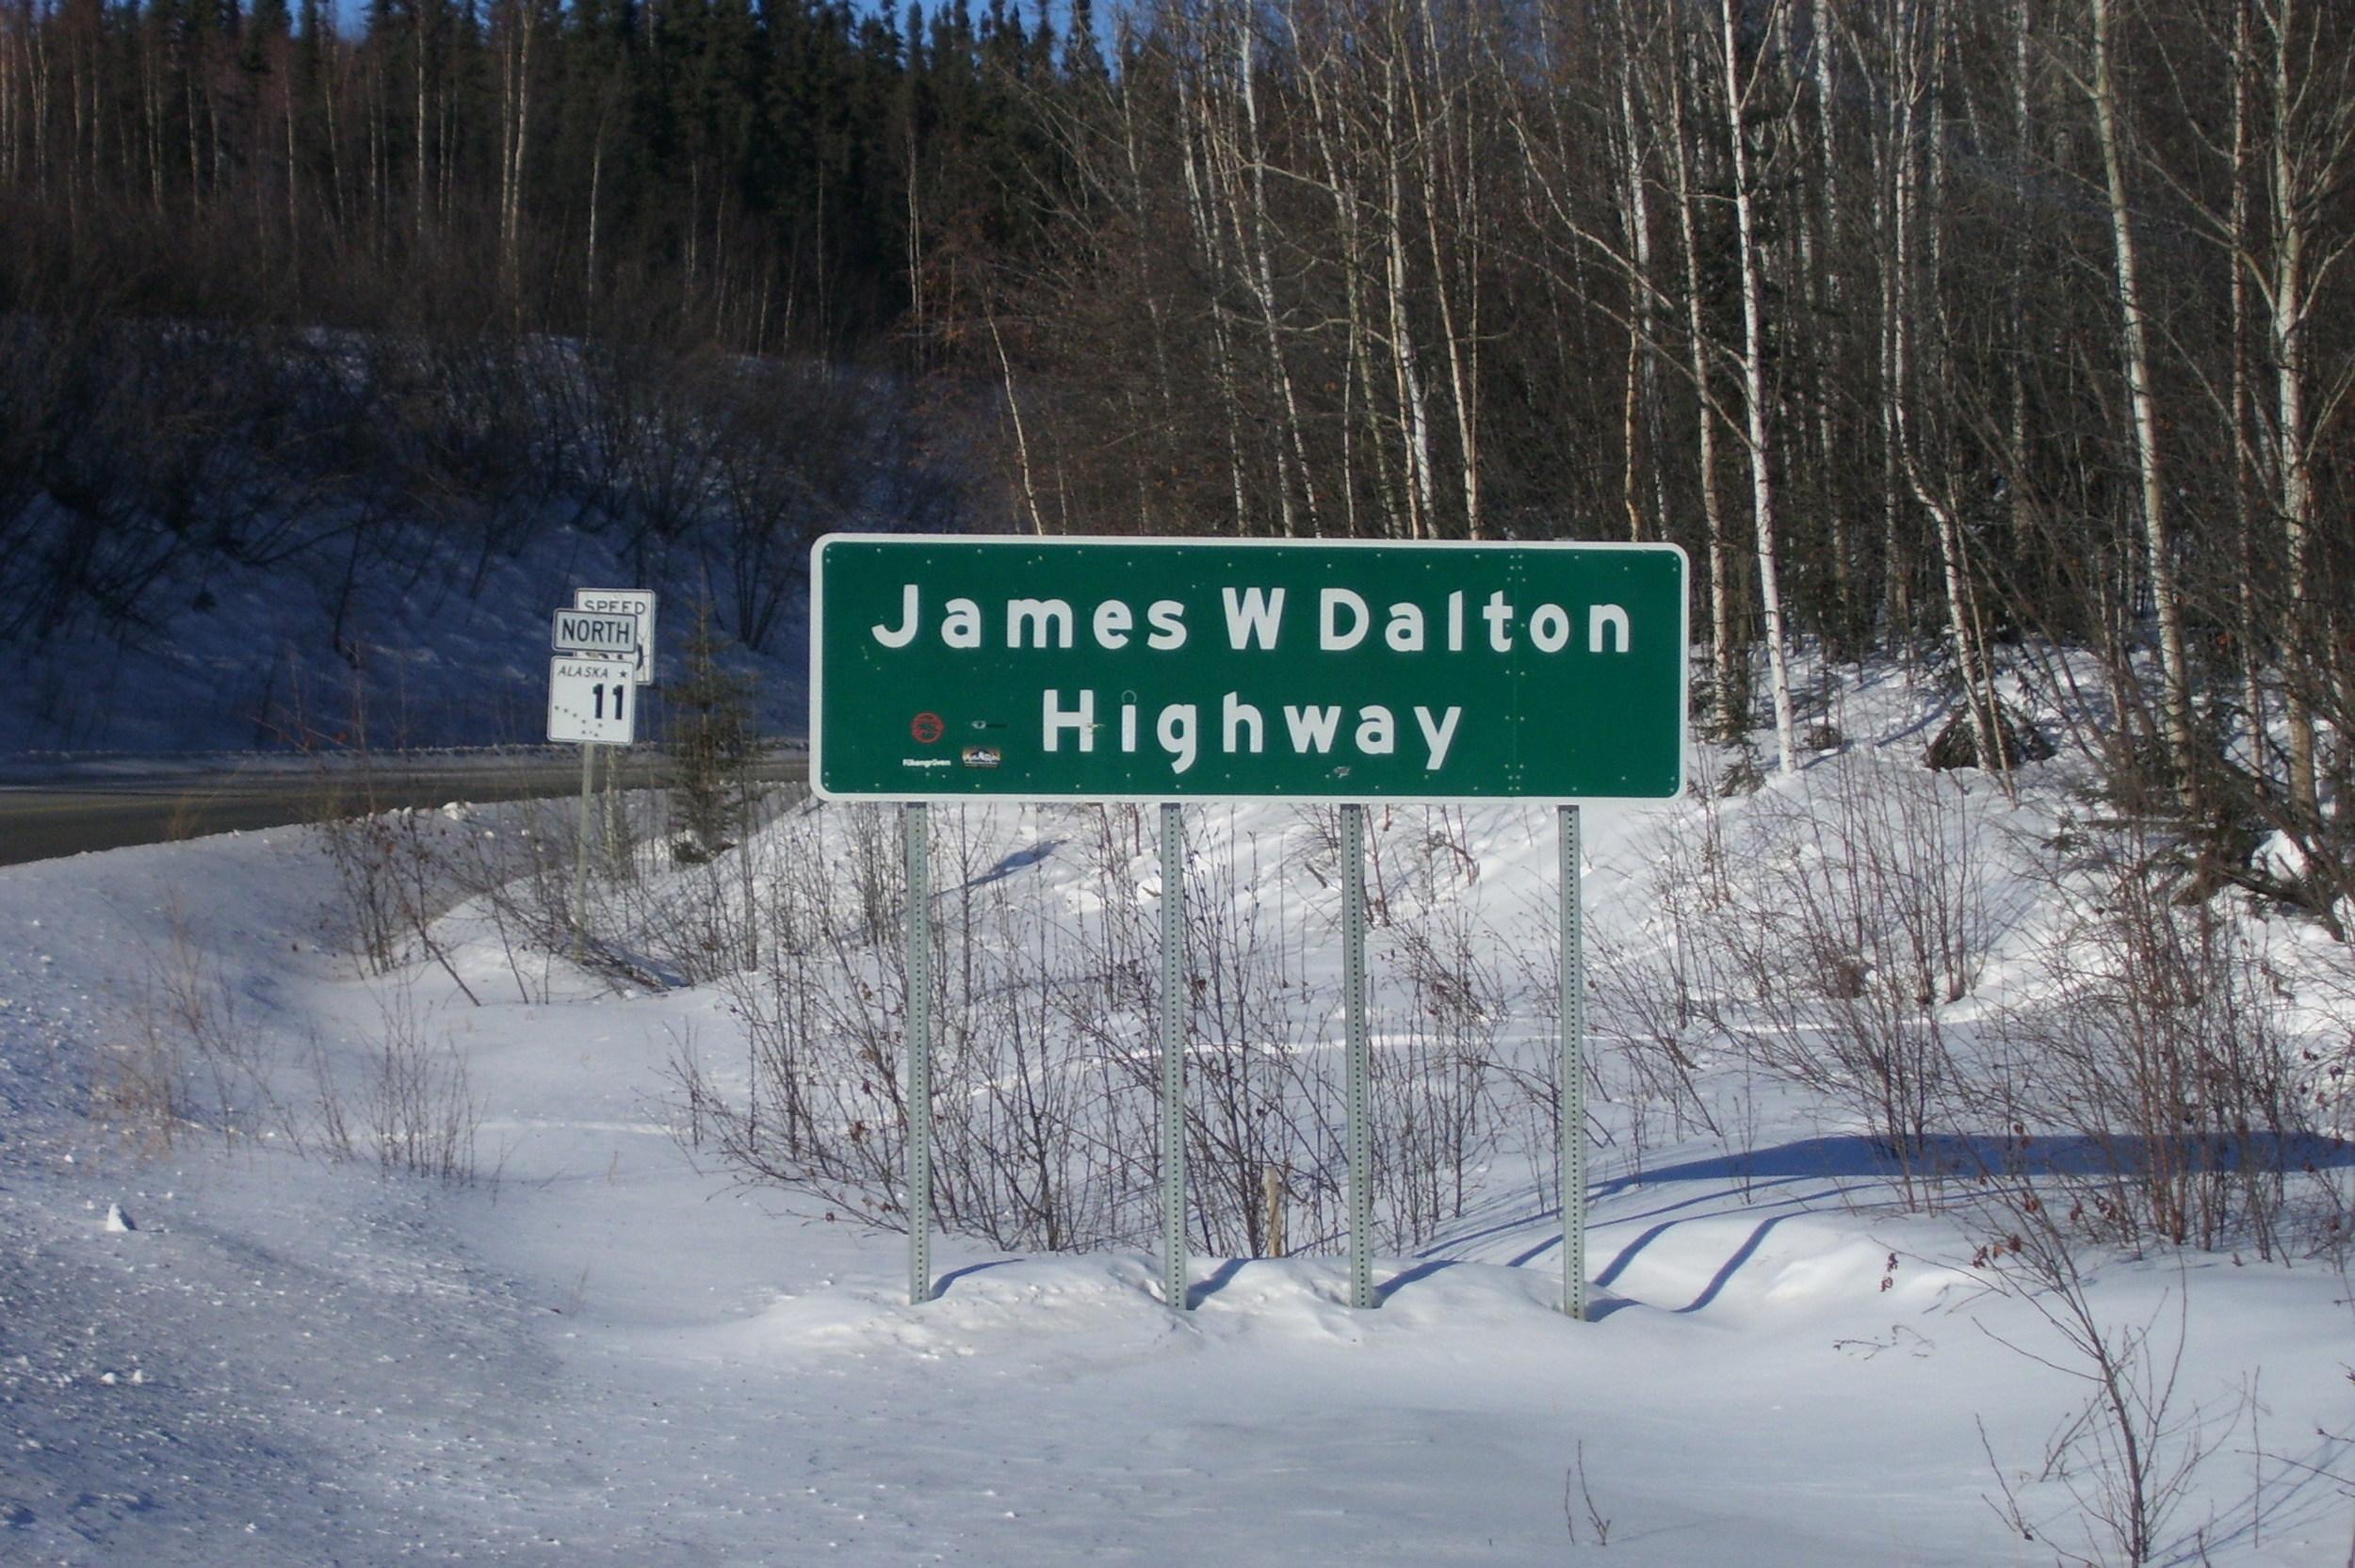 Dalton Highway - Rob Branham 2007.JPG